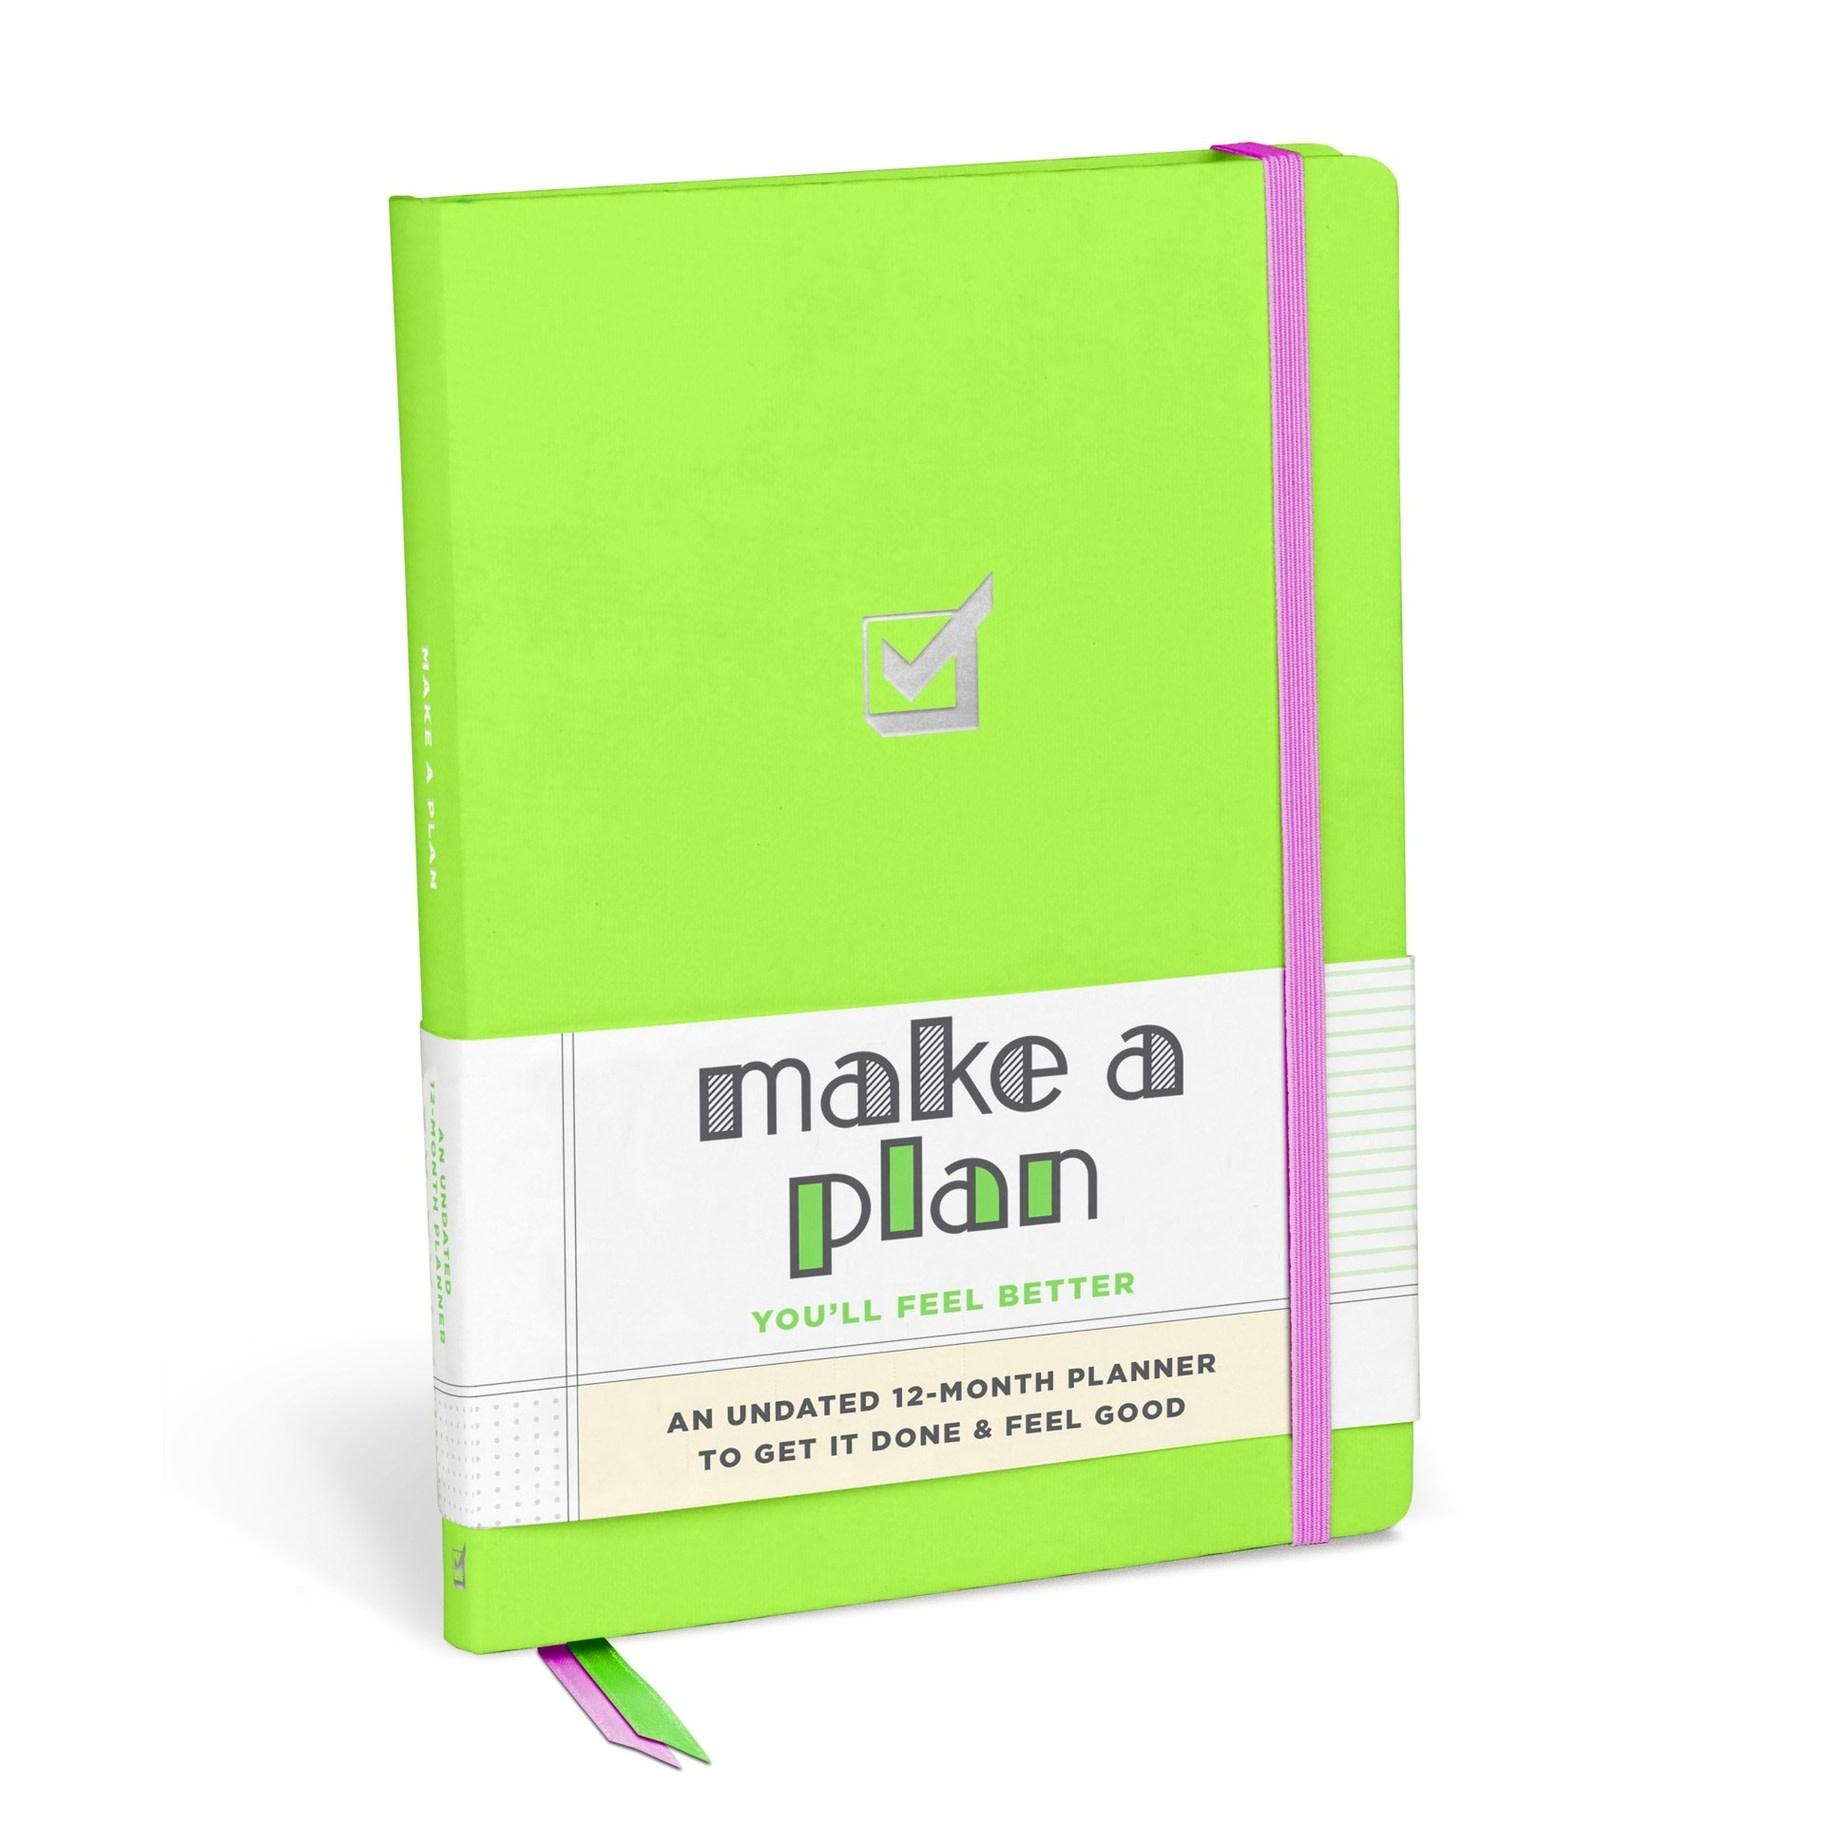 Make a Plan Hardcover Planner